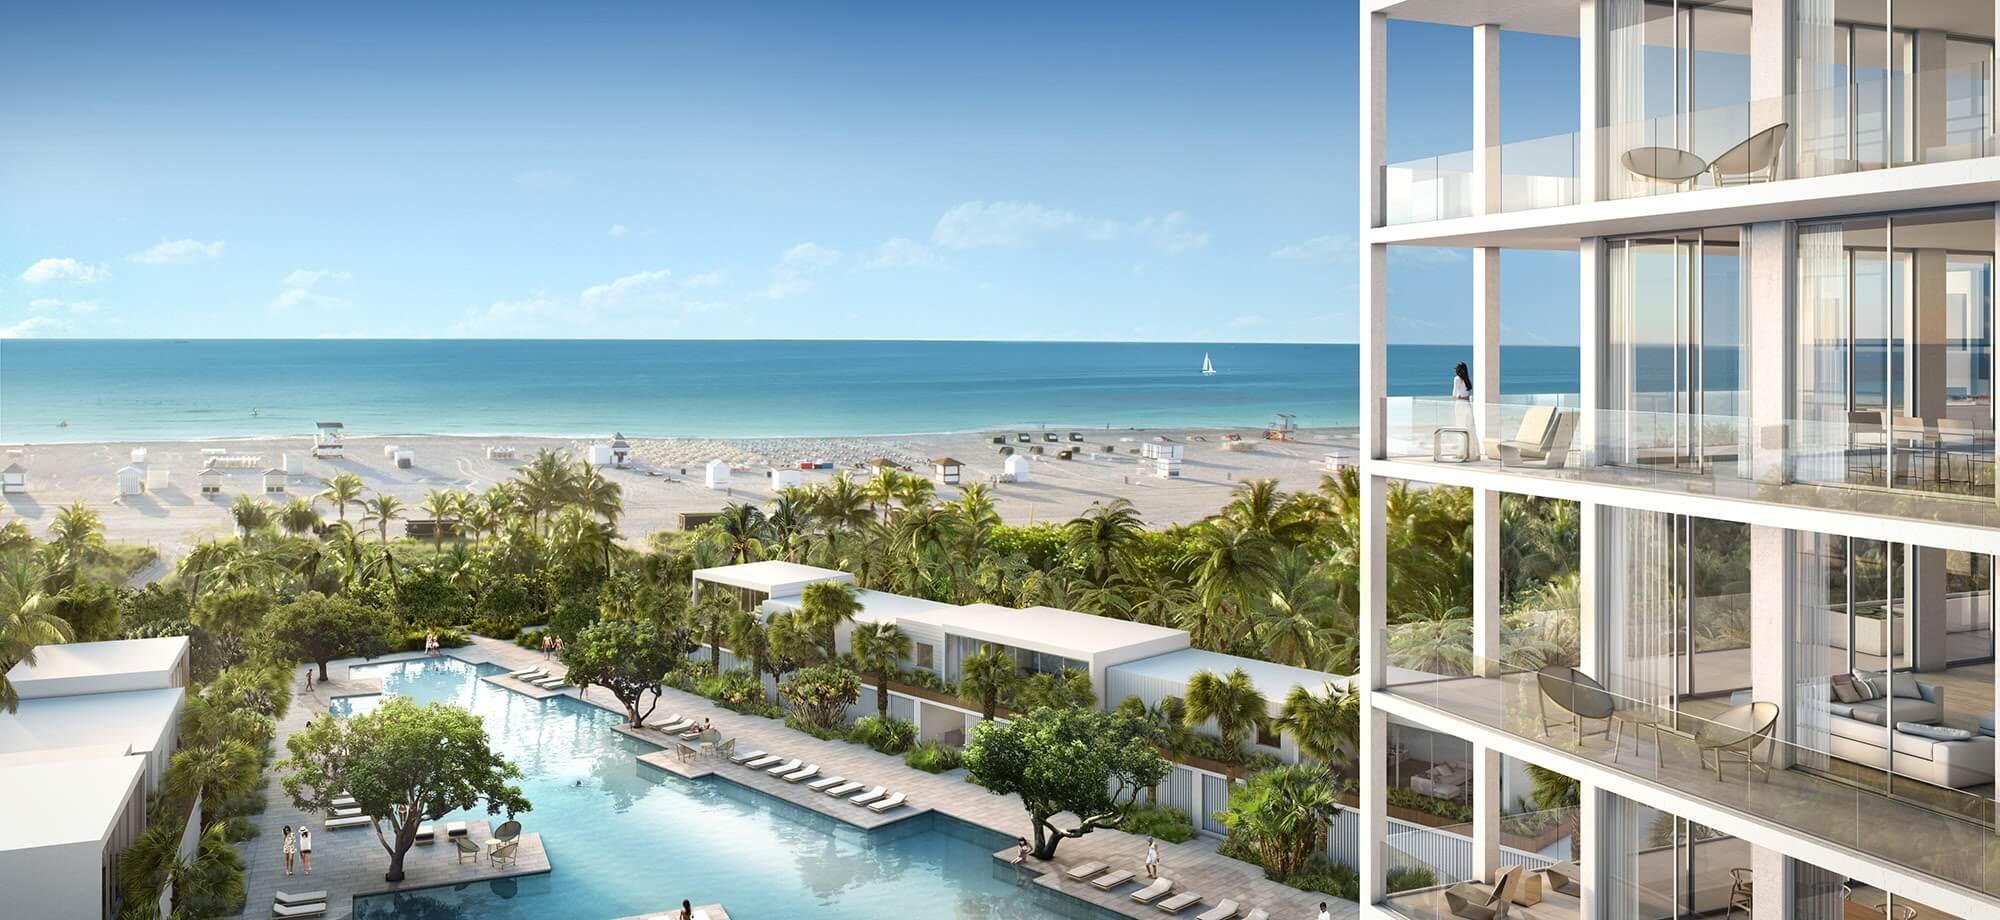 HFZ_Shore-Club-Luxury-Residential-Miami-Exterior-Facade